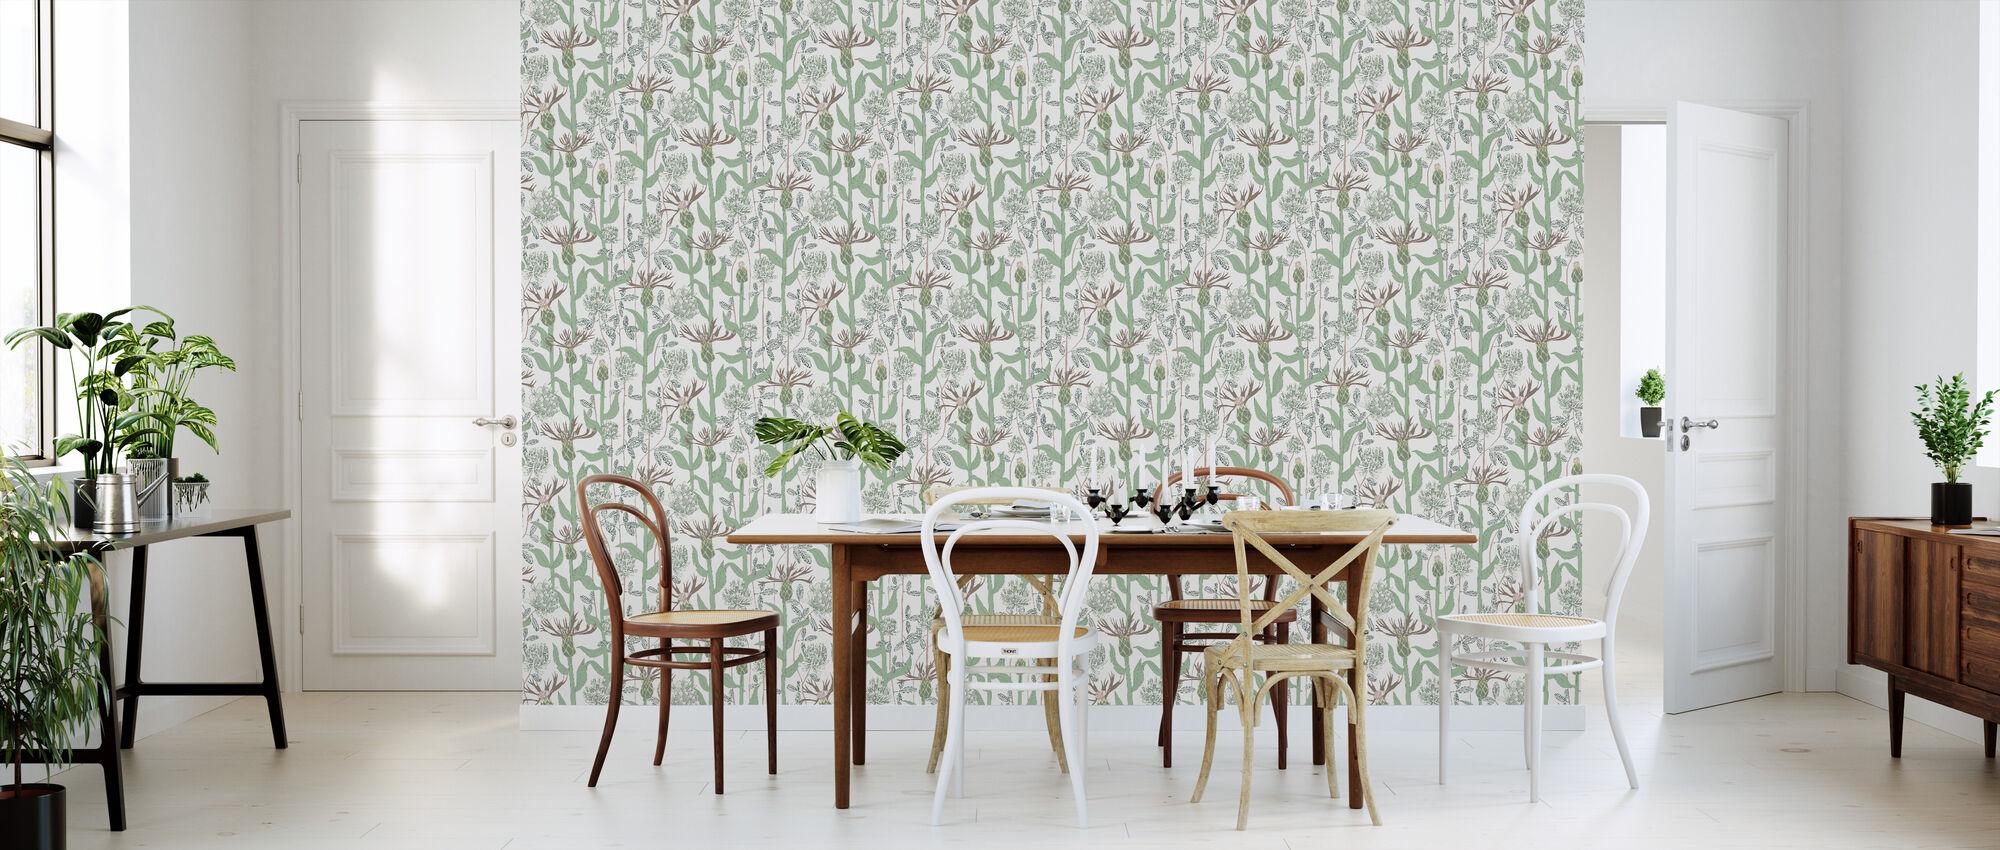 A Warm Summer's Day - Green - Wallpaper - Kitchen